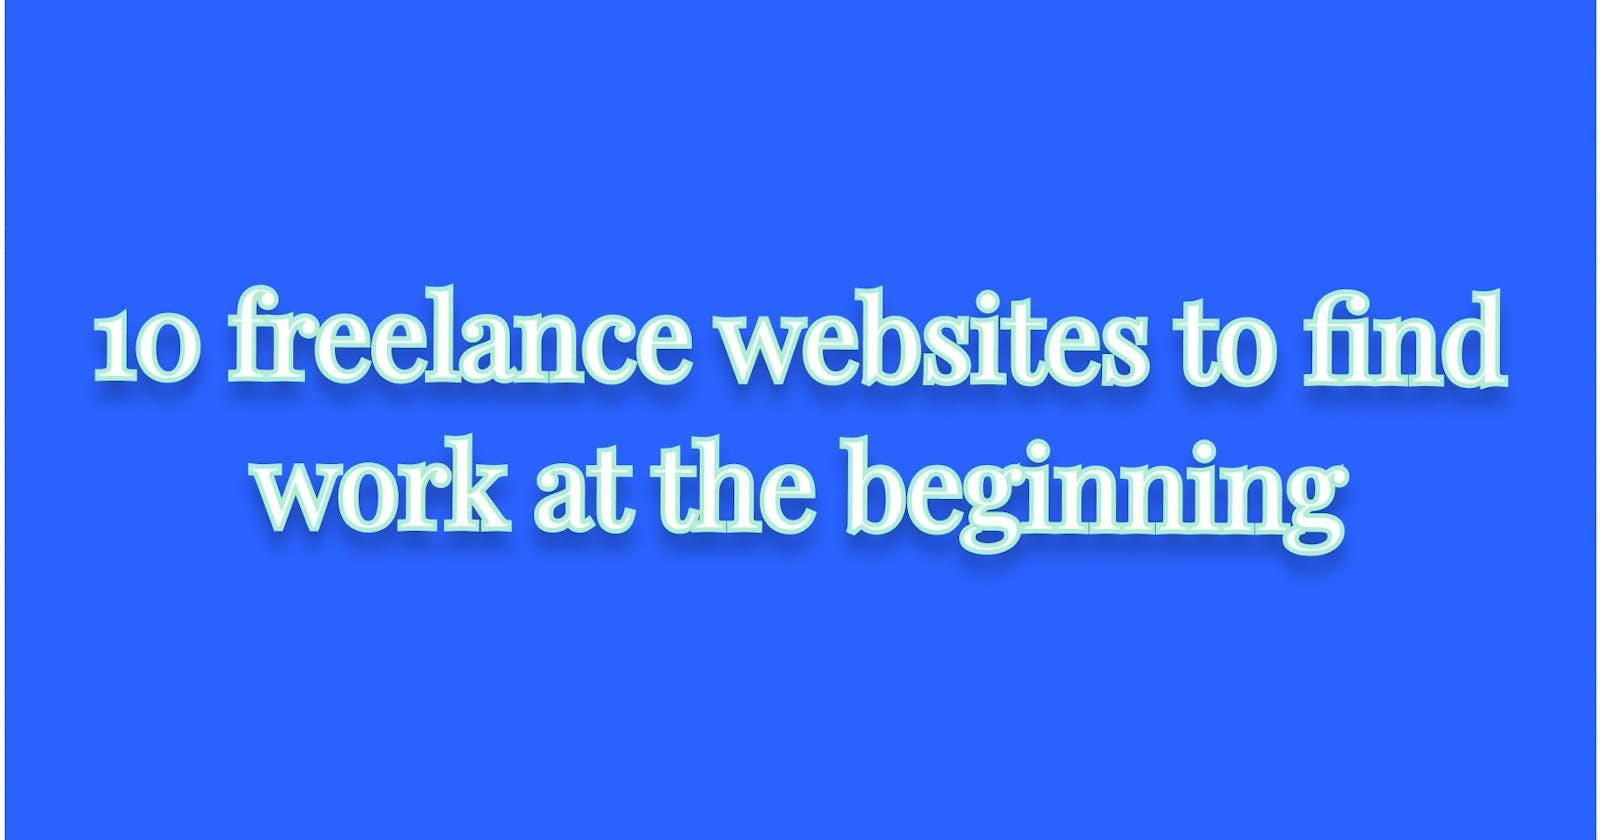 10 freelance websites to find work at the beginning